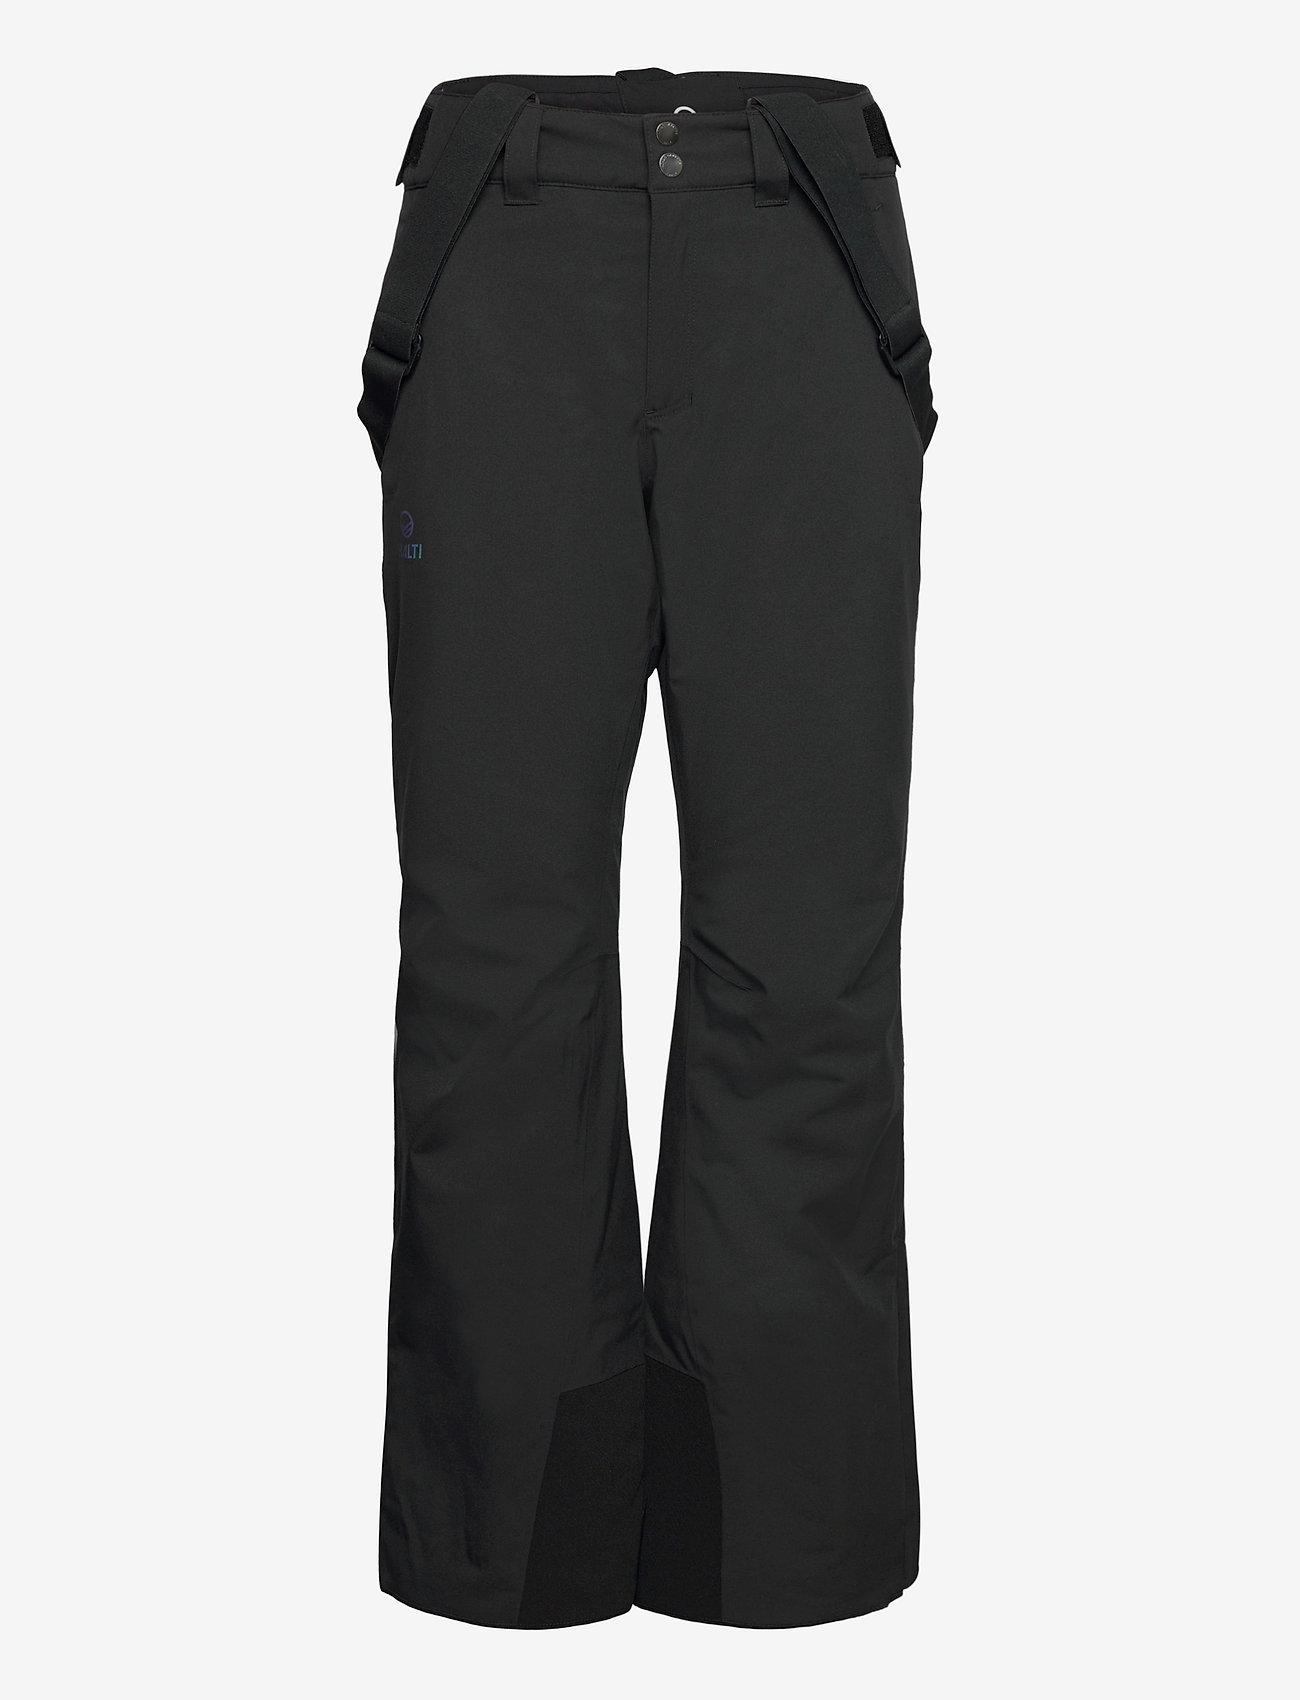 Halti - Puntti Recy W DX ski pants - skibroeken - black - 1